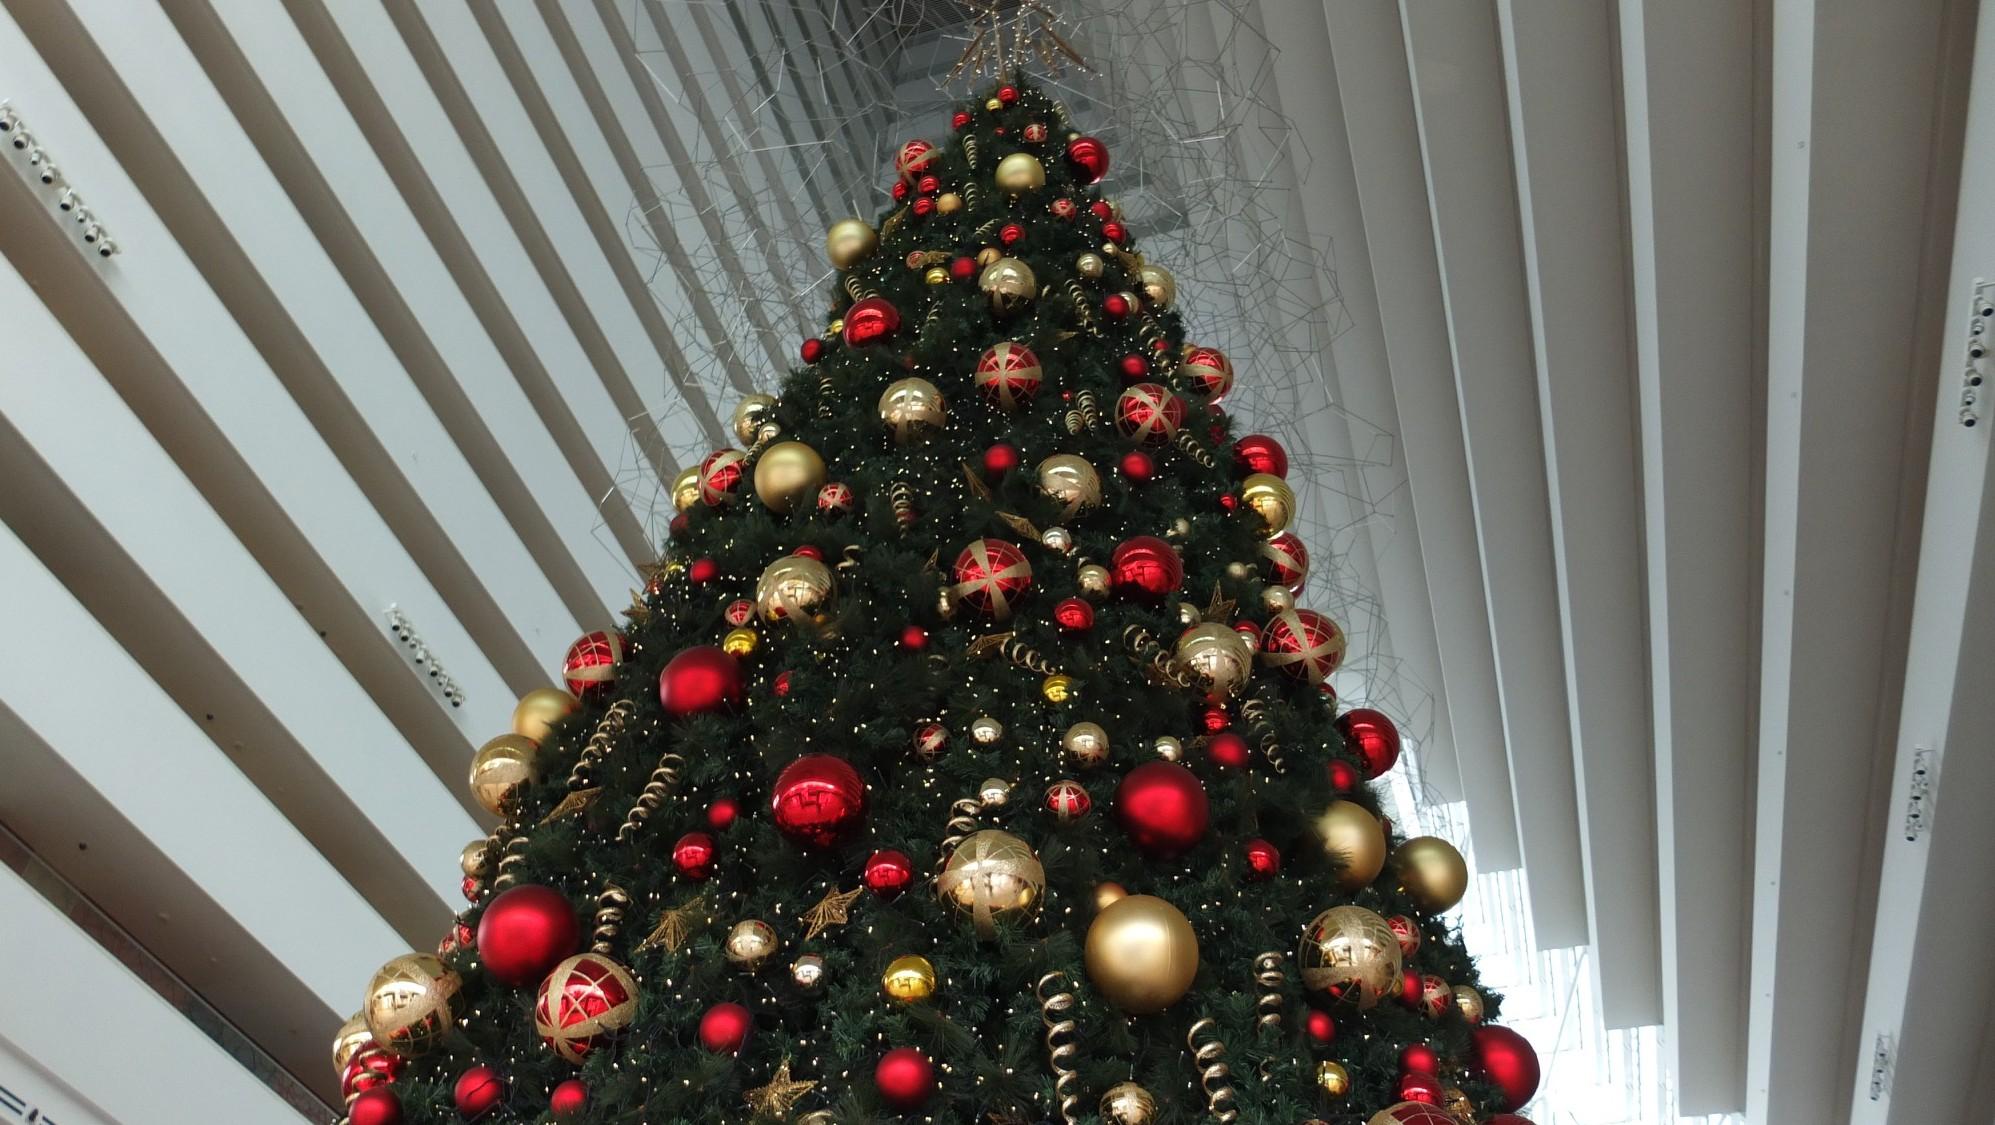 Christbaum Marina Bay Sands Hotel Singapur, Dominik Sommerer, Dominiks Welt